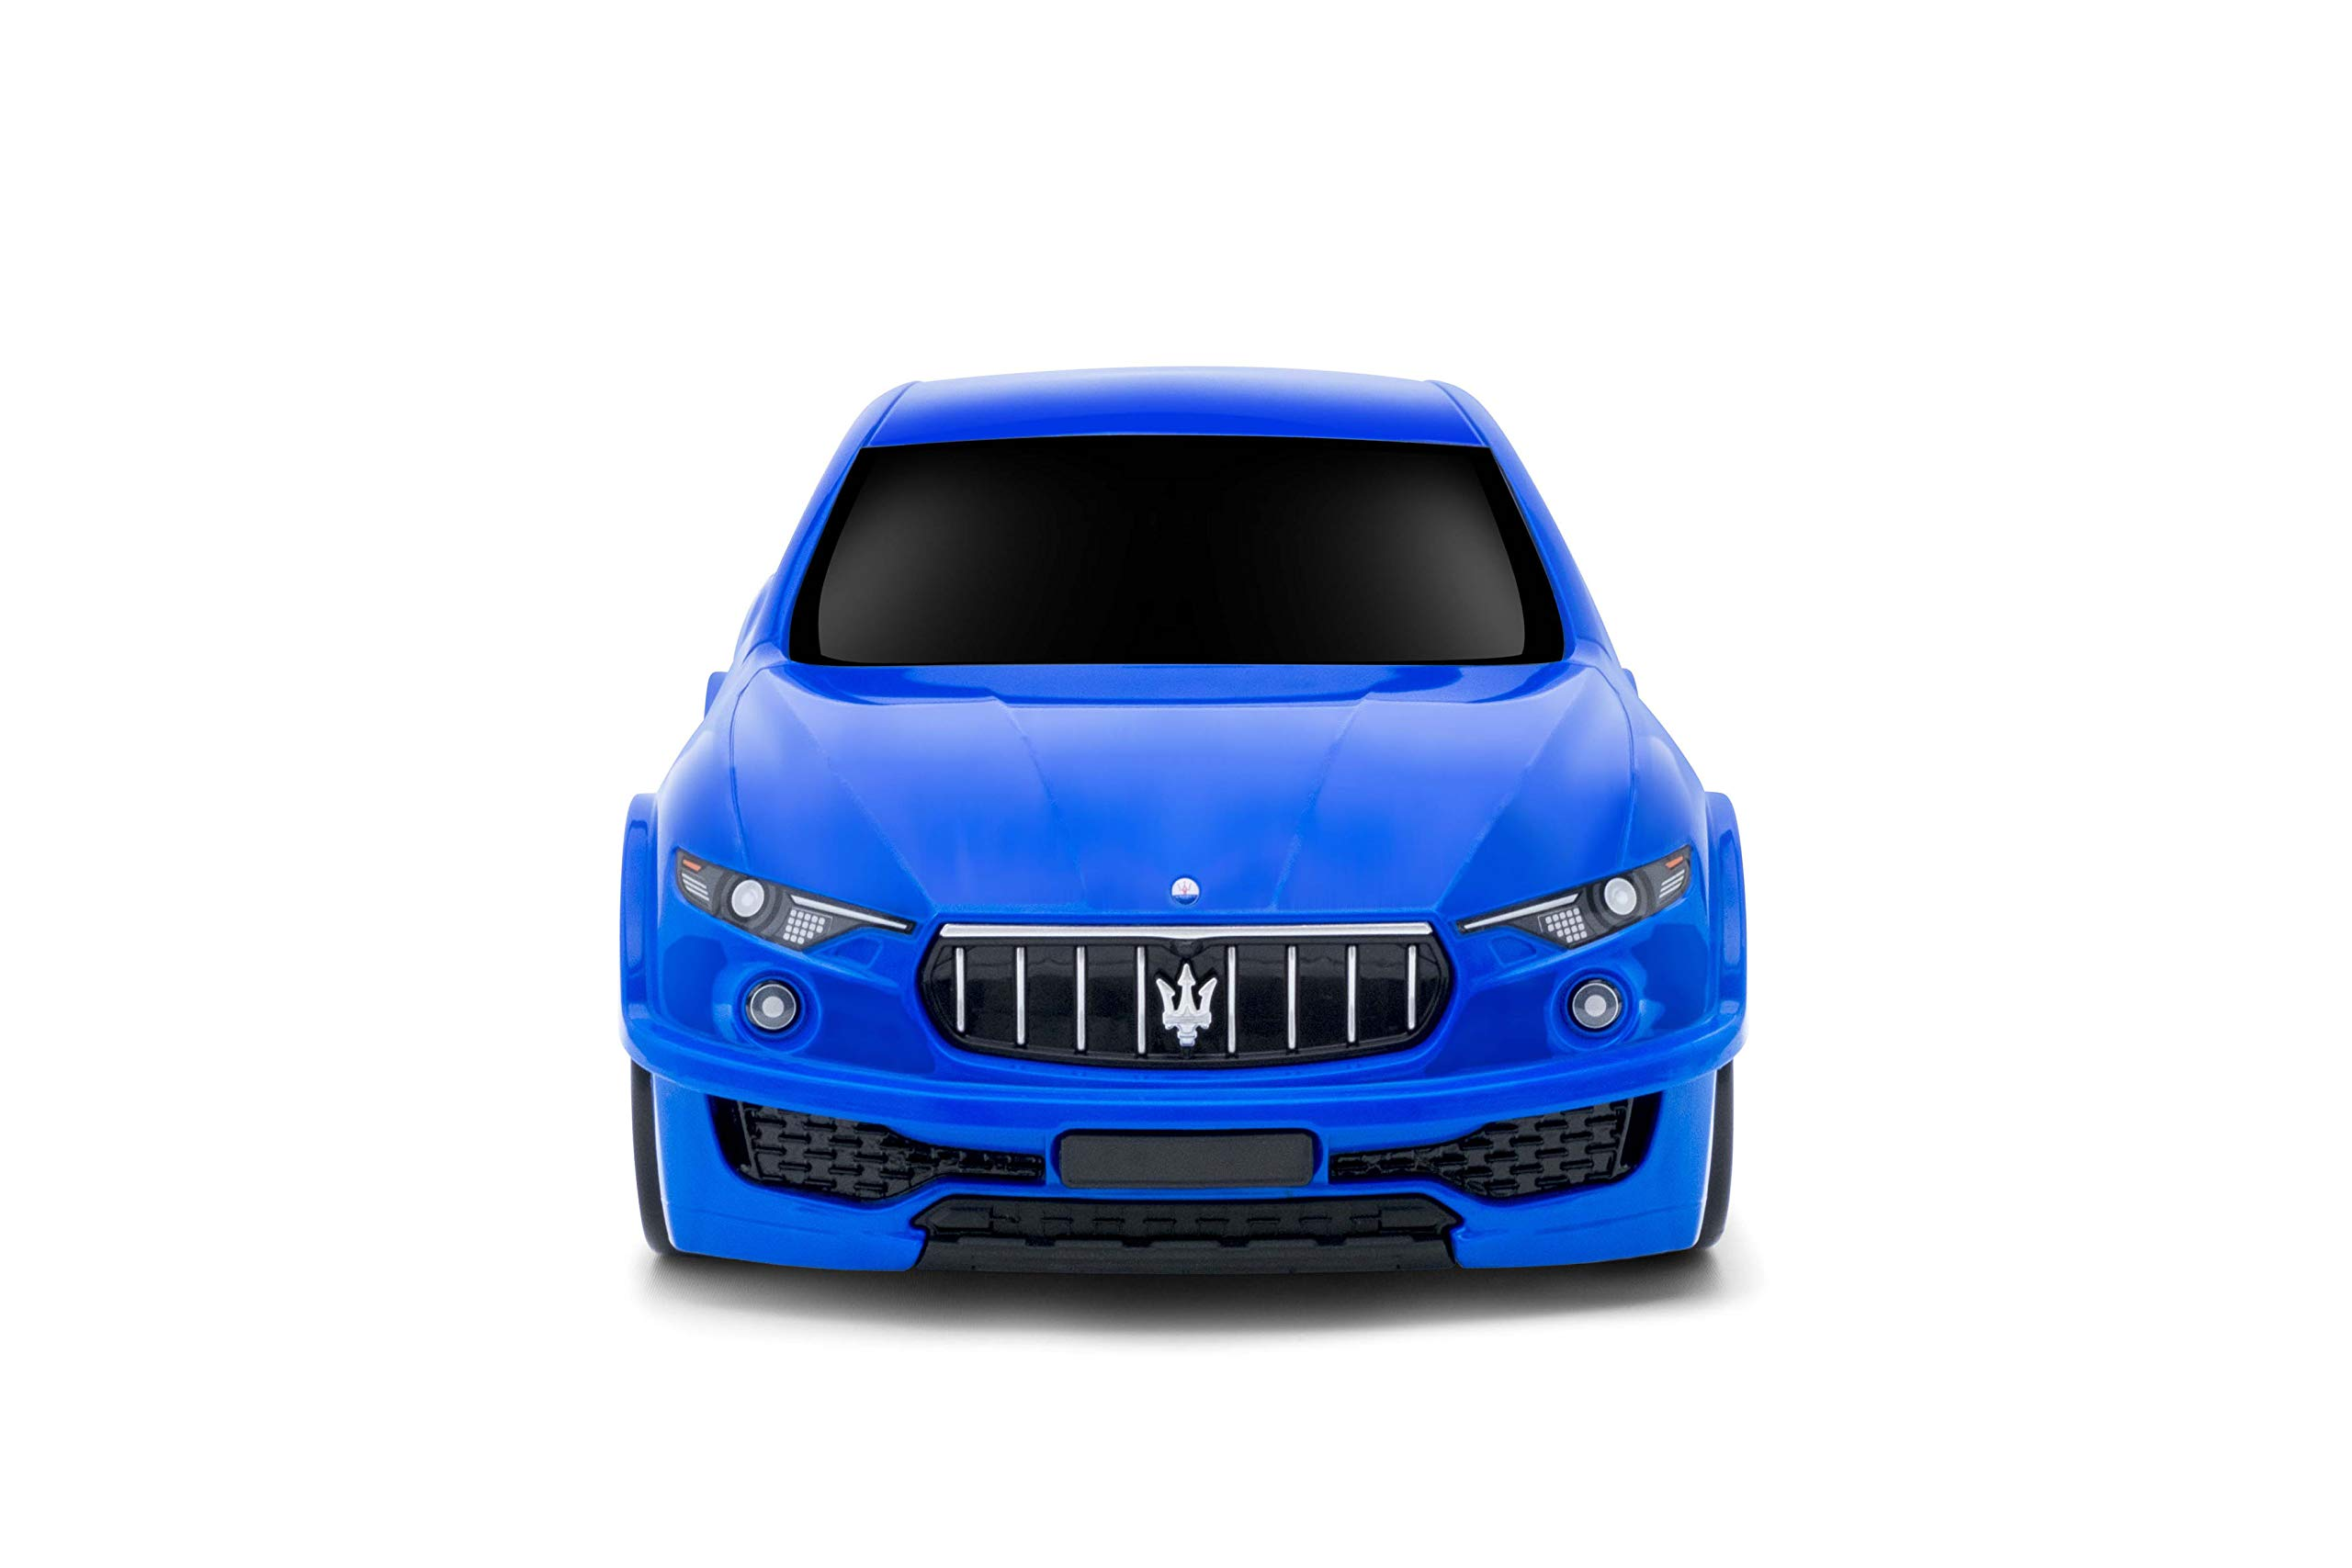 Lightweight Maserati Levante Kids Carry-on Hand Luggage Suitcase- Blue